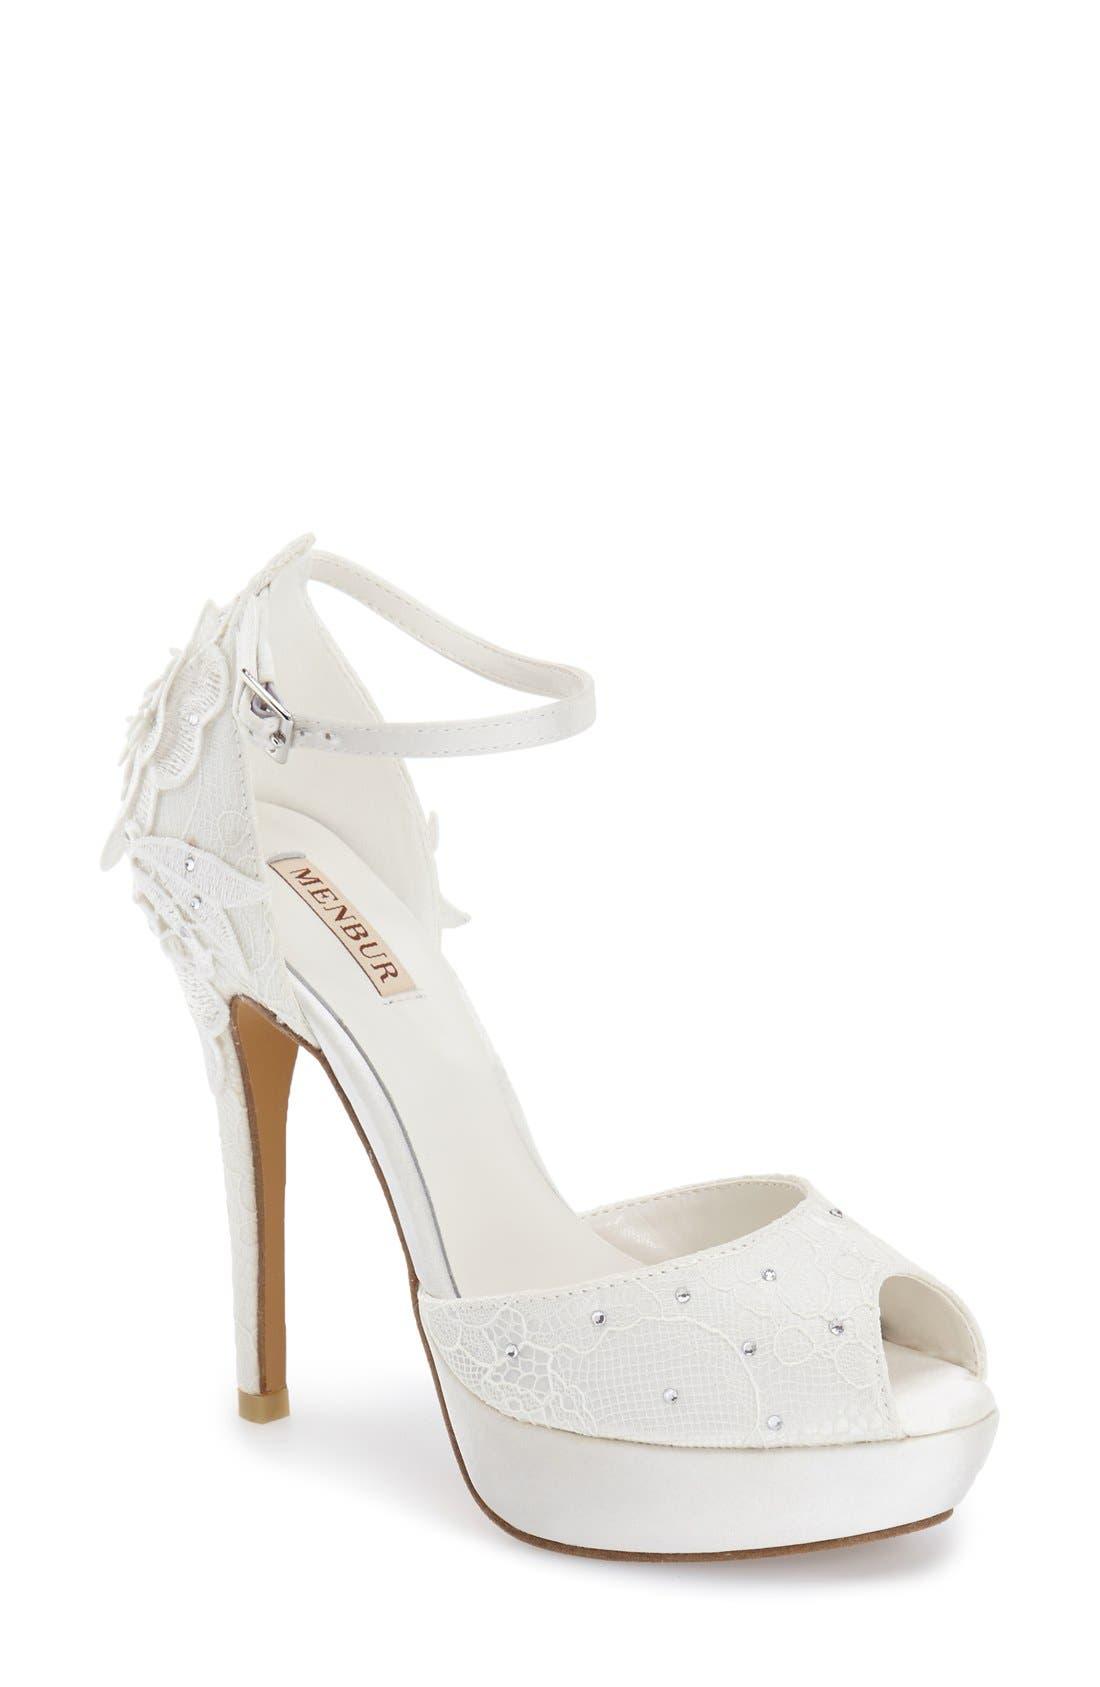 Main Image - Menbur 'Dafne' Lace & Crystal Platform Sandal (Women)